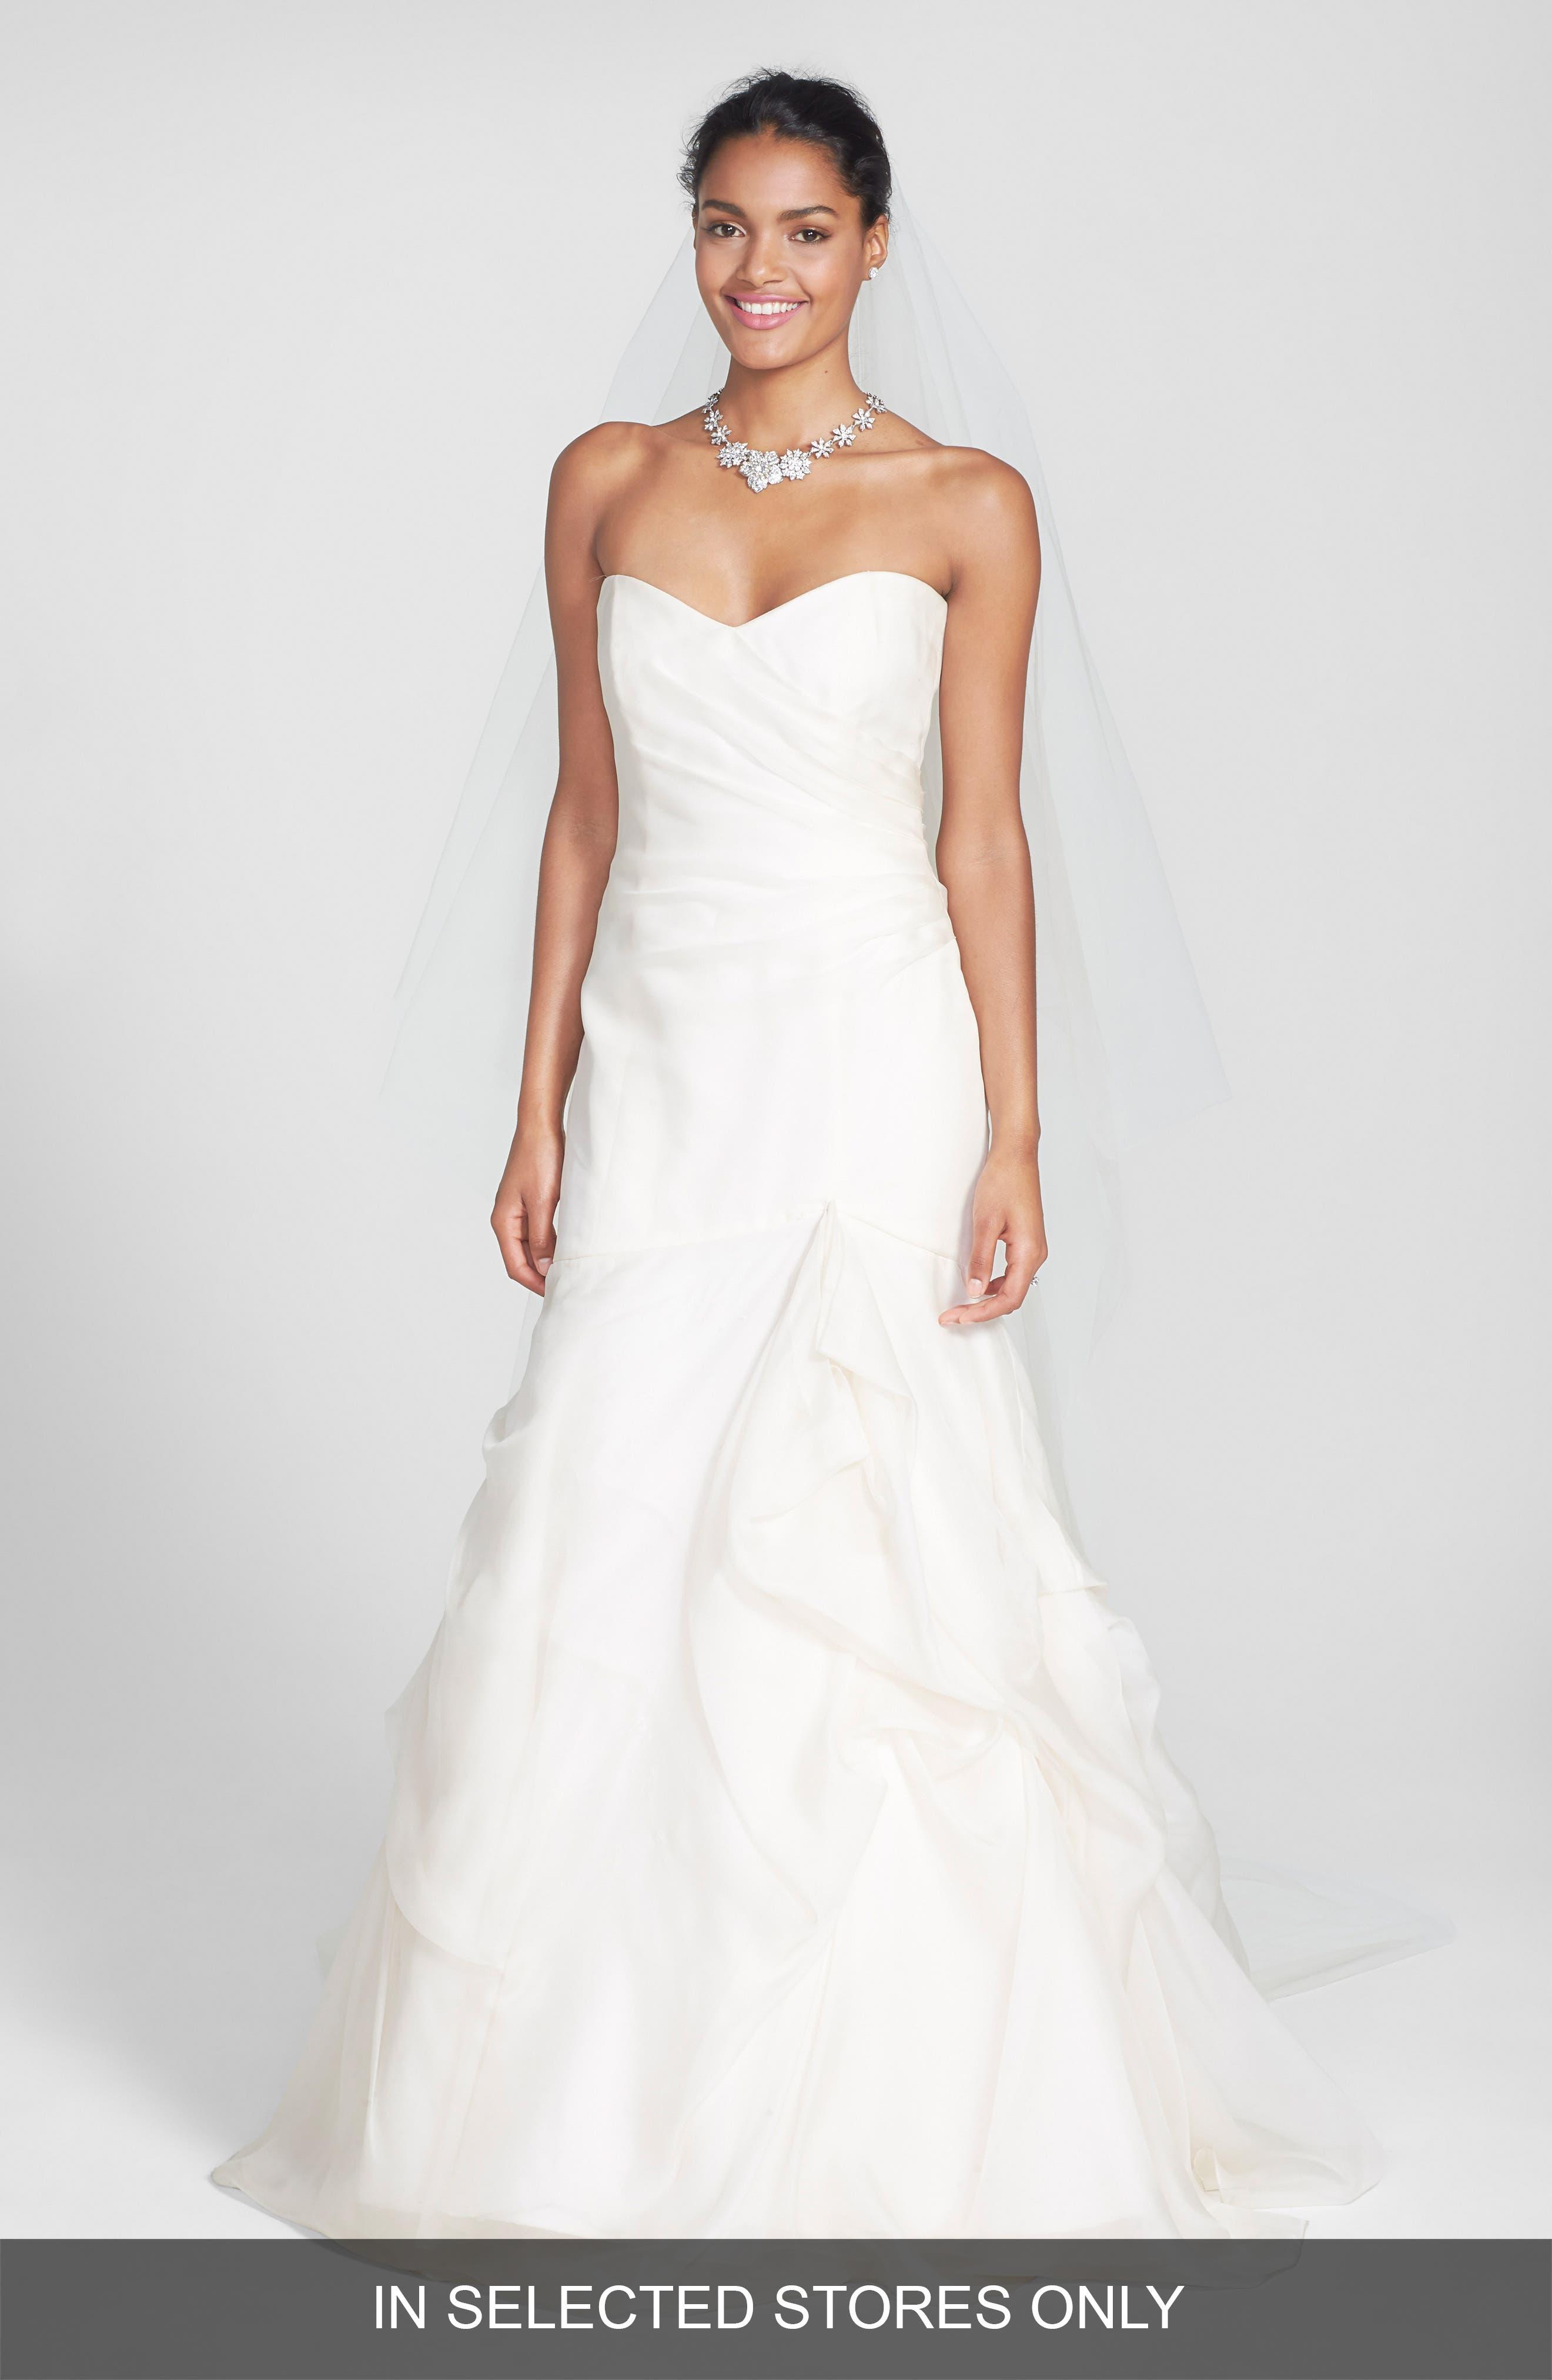 Alternate Image 1 Selected - BLISS Monique Lhuillier Strapless Silk Organza Mermaid Wedding Dress